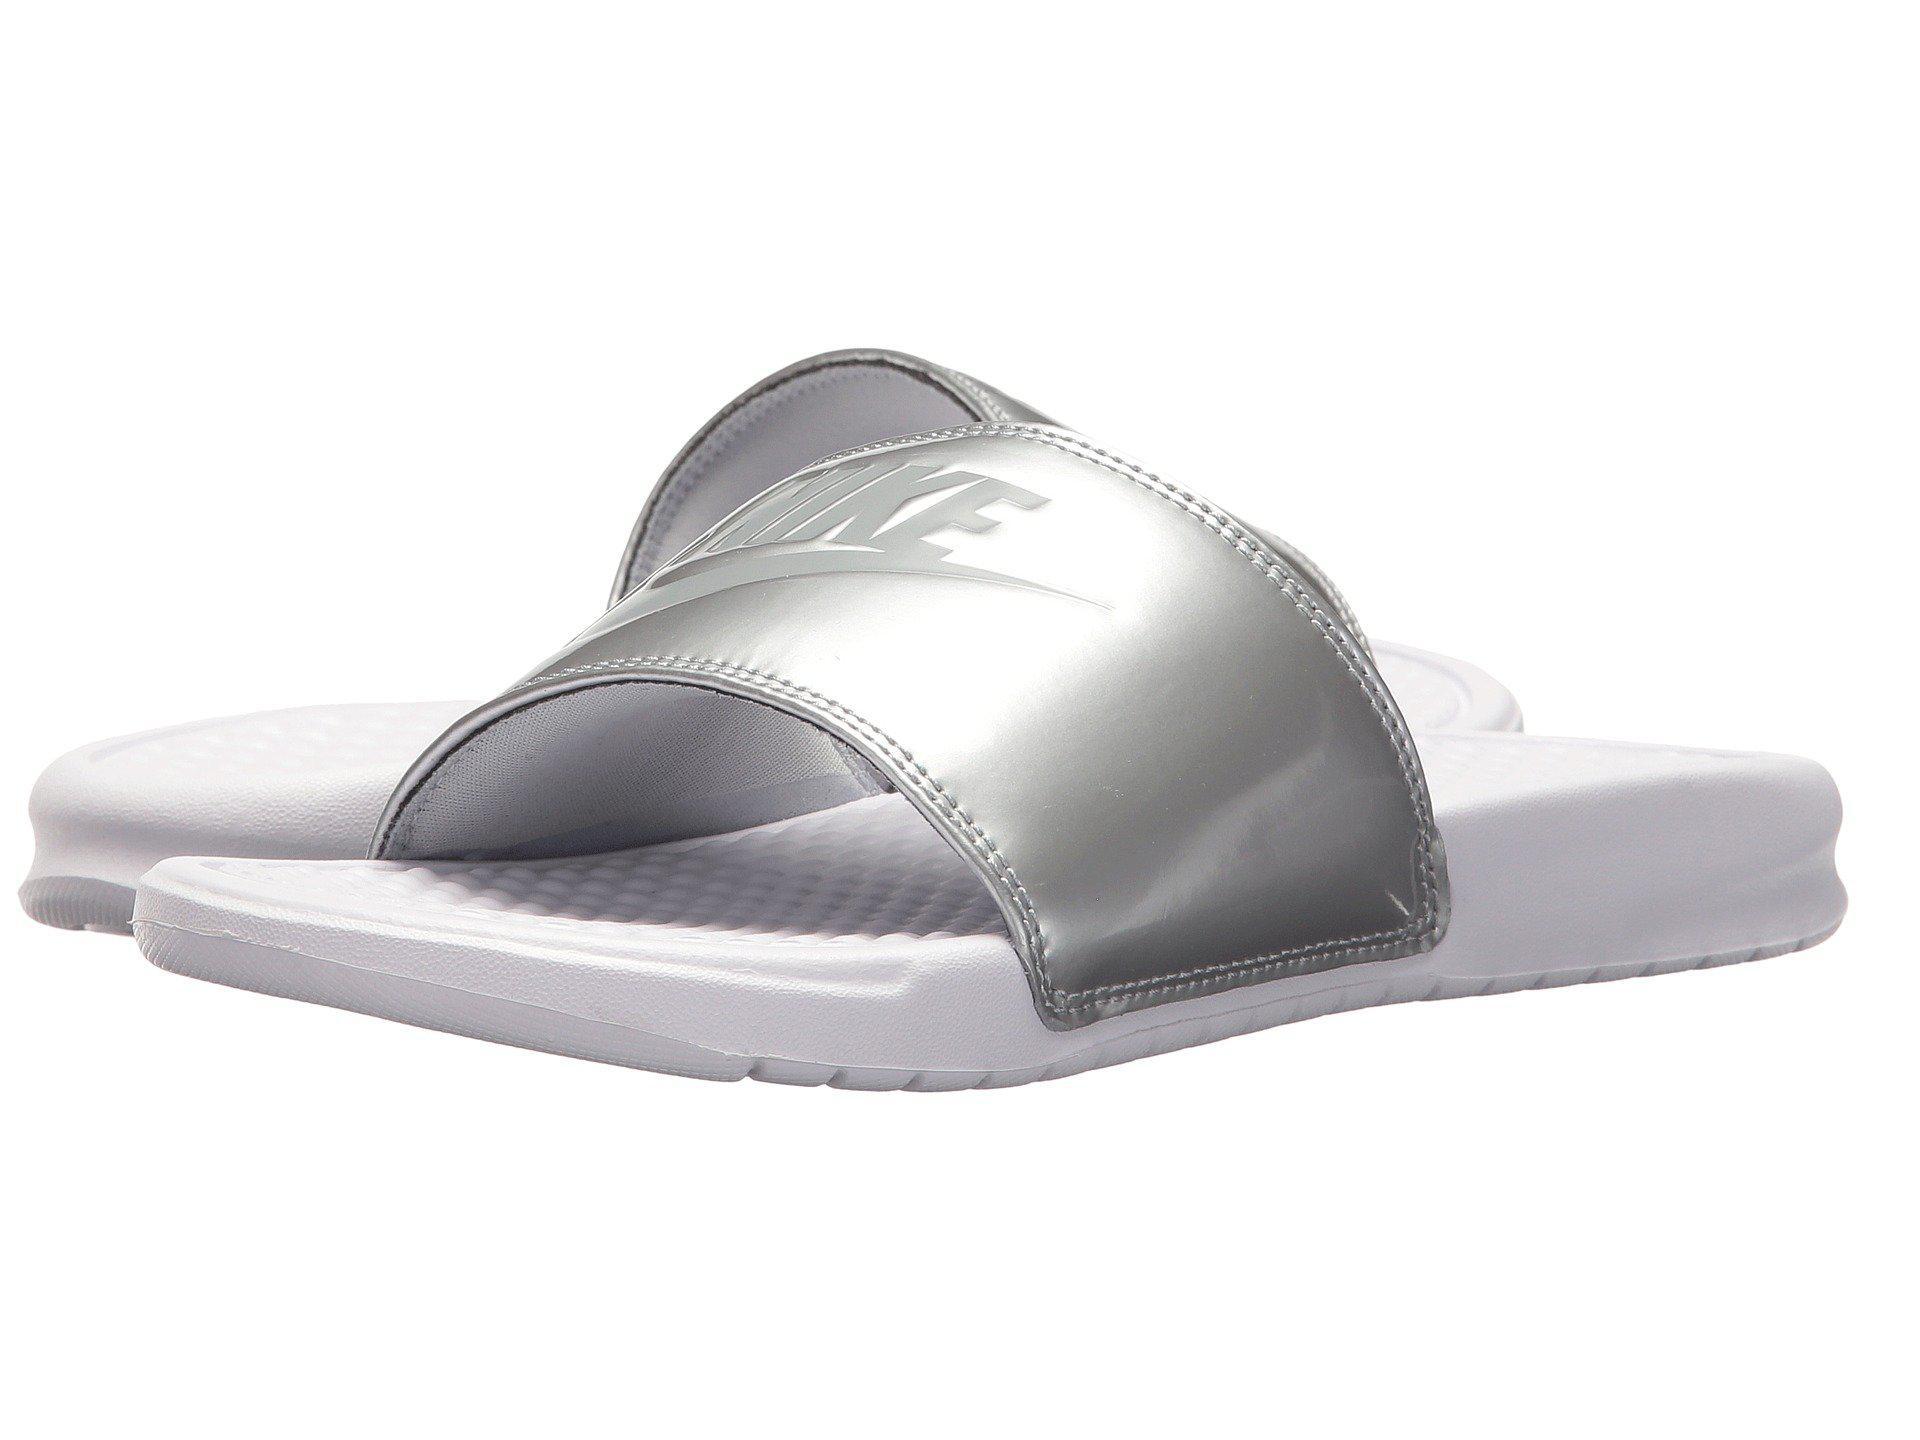 quality design 3cccb 95d37 Nike. Benassi Jdi Slide (white-metallic Silver) Women s Sandals